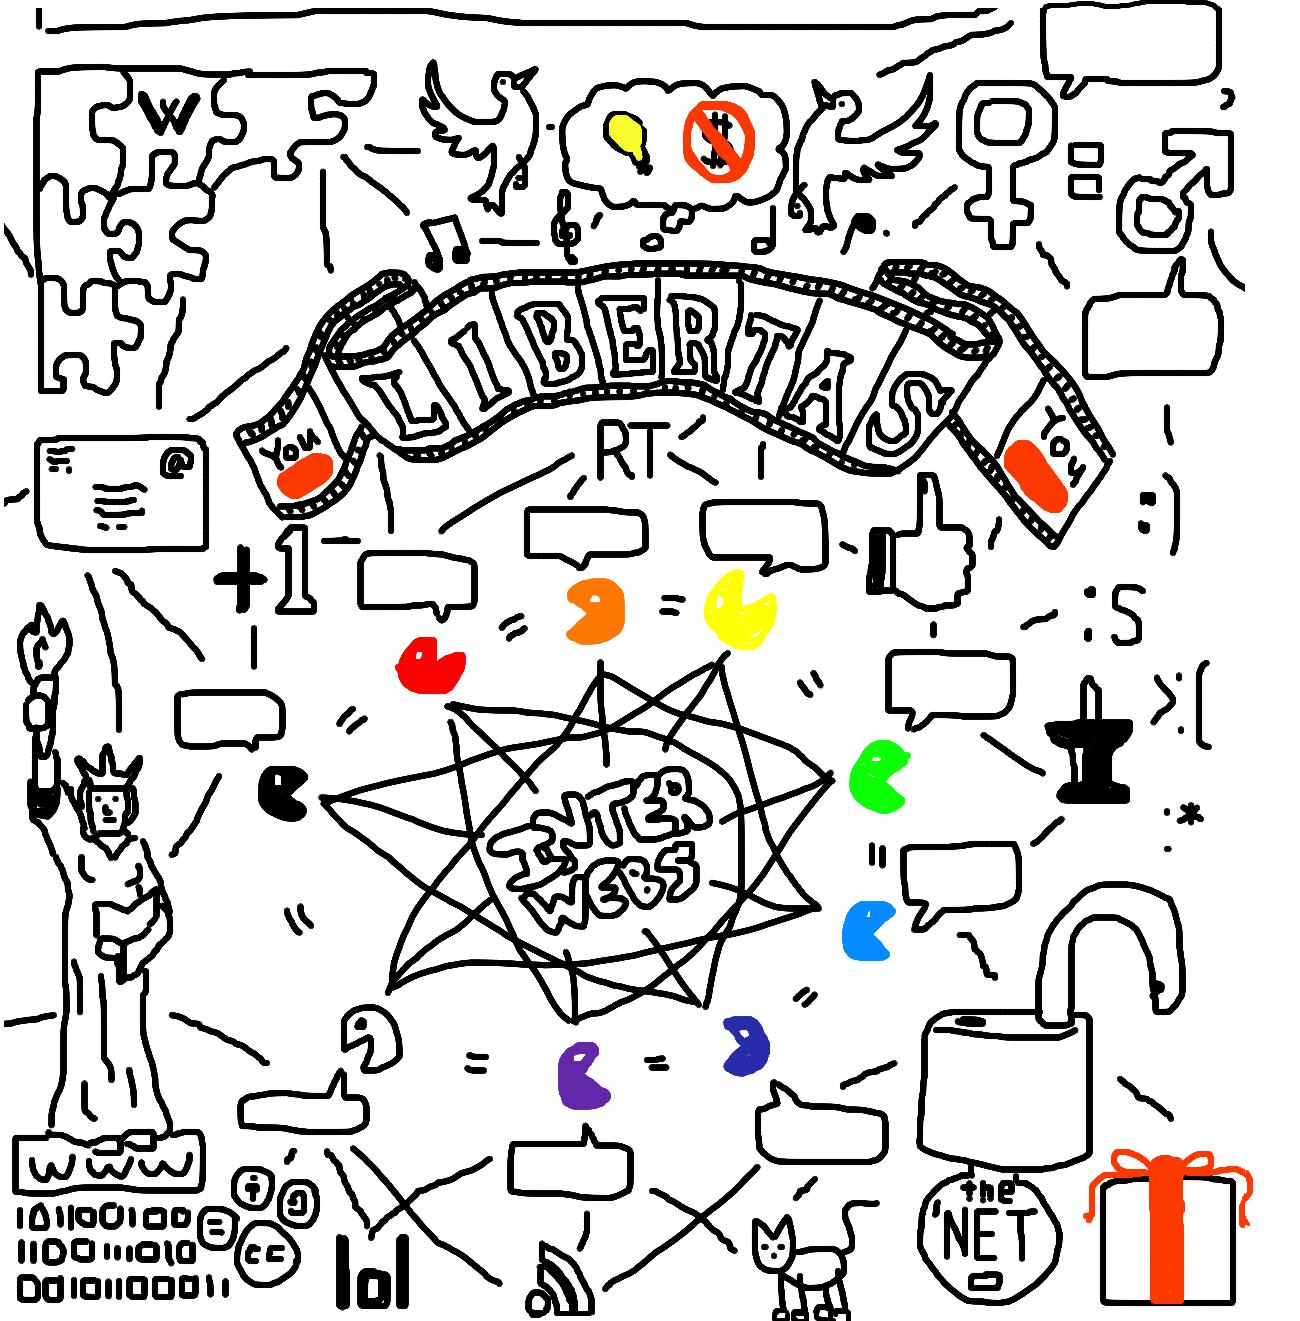 doodle, internet, free internet, open internet,